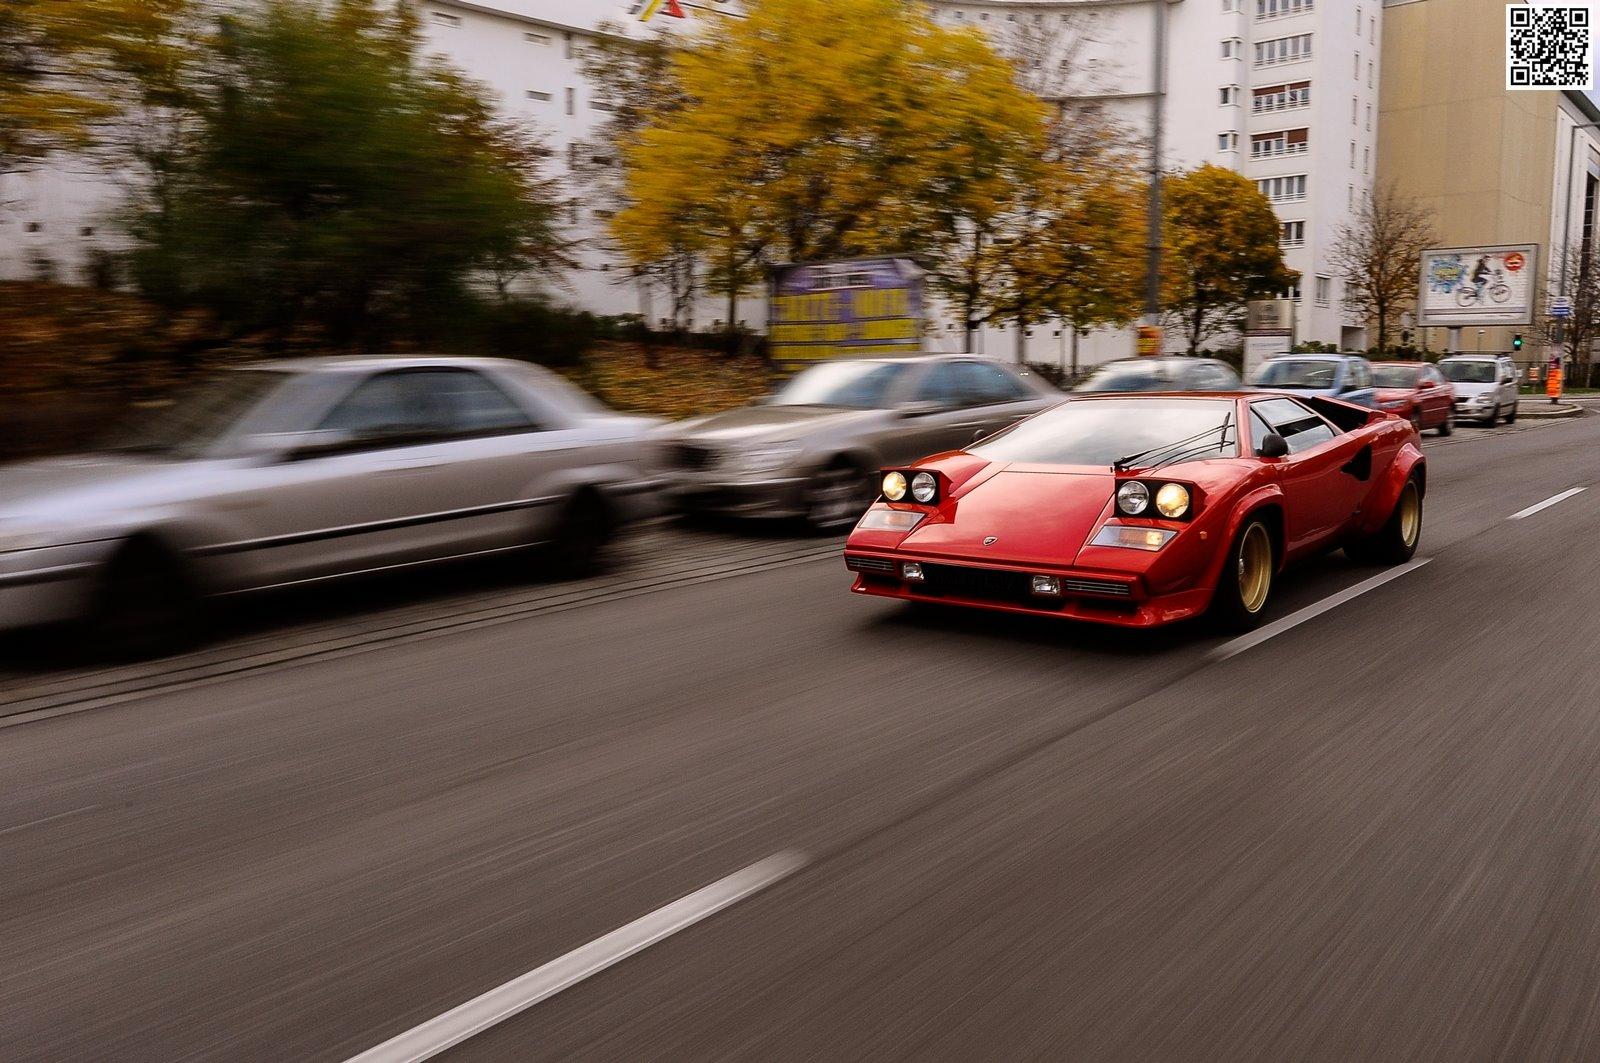 Enjoy This Red Wingless Lamborghini Countach